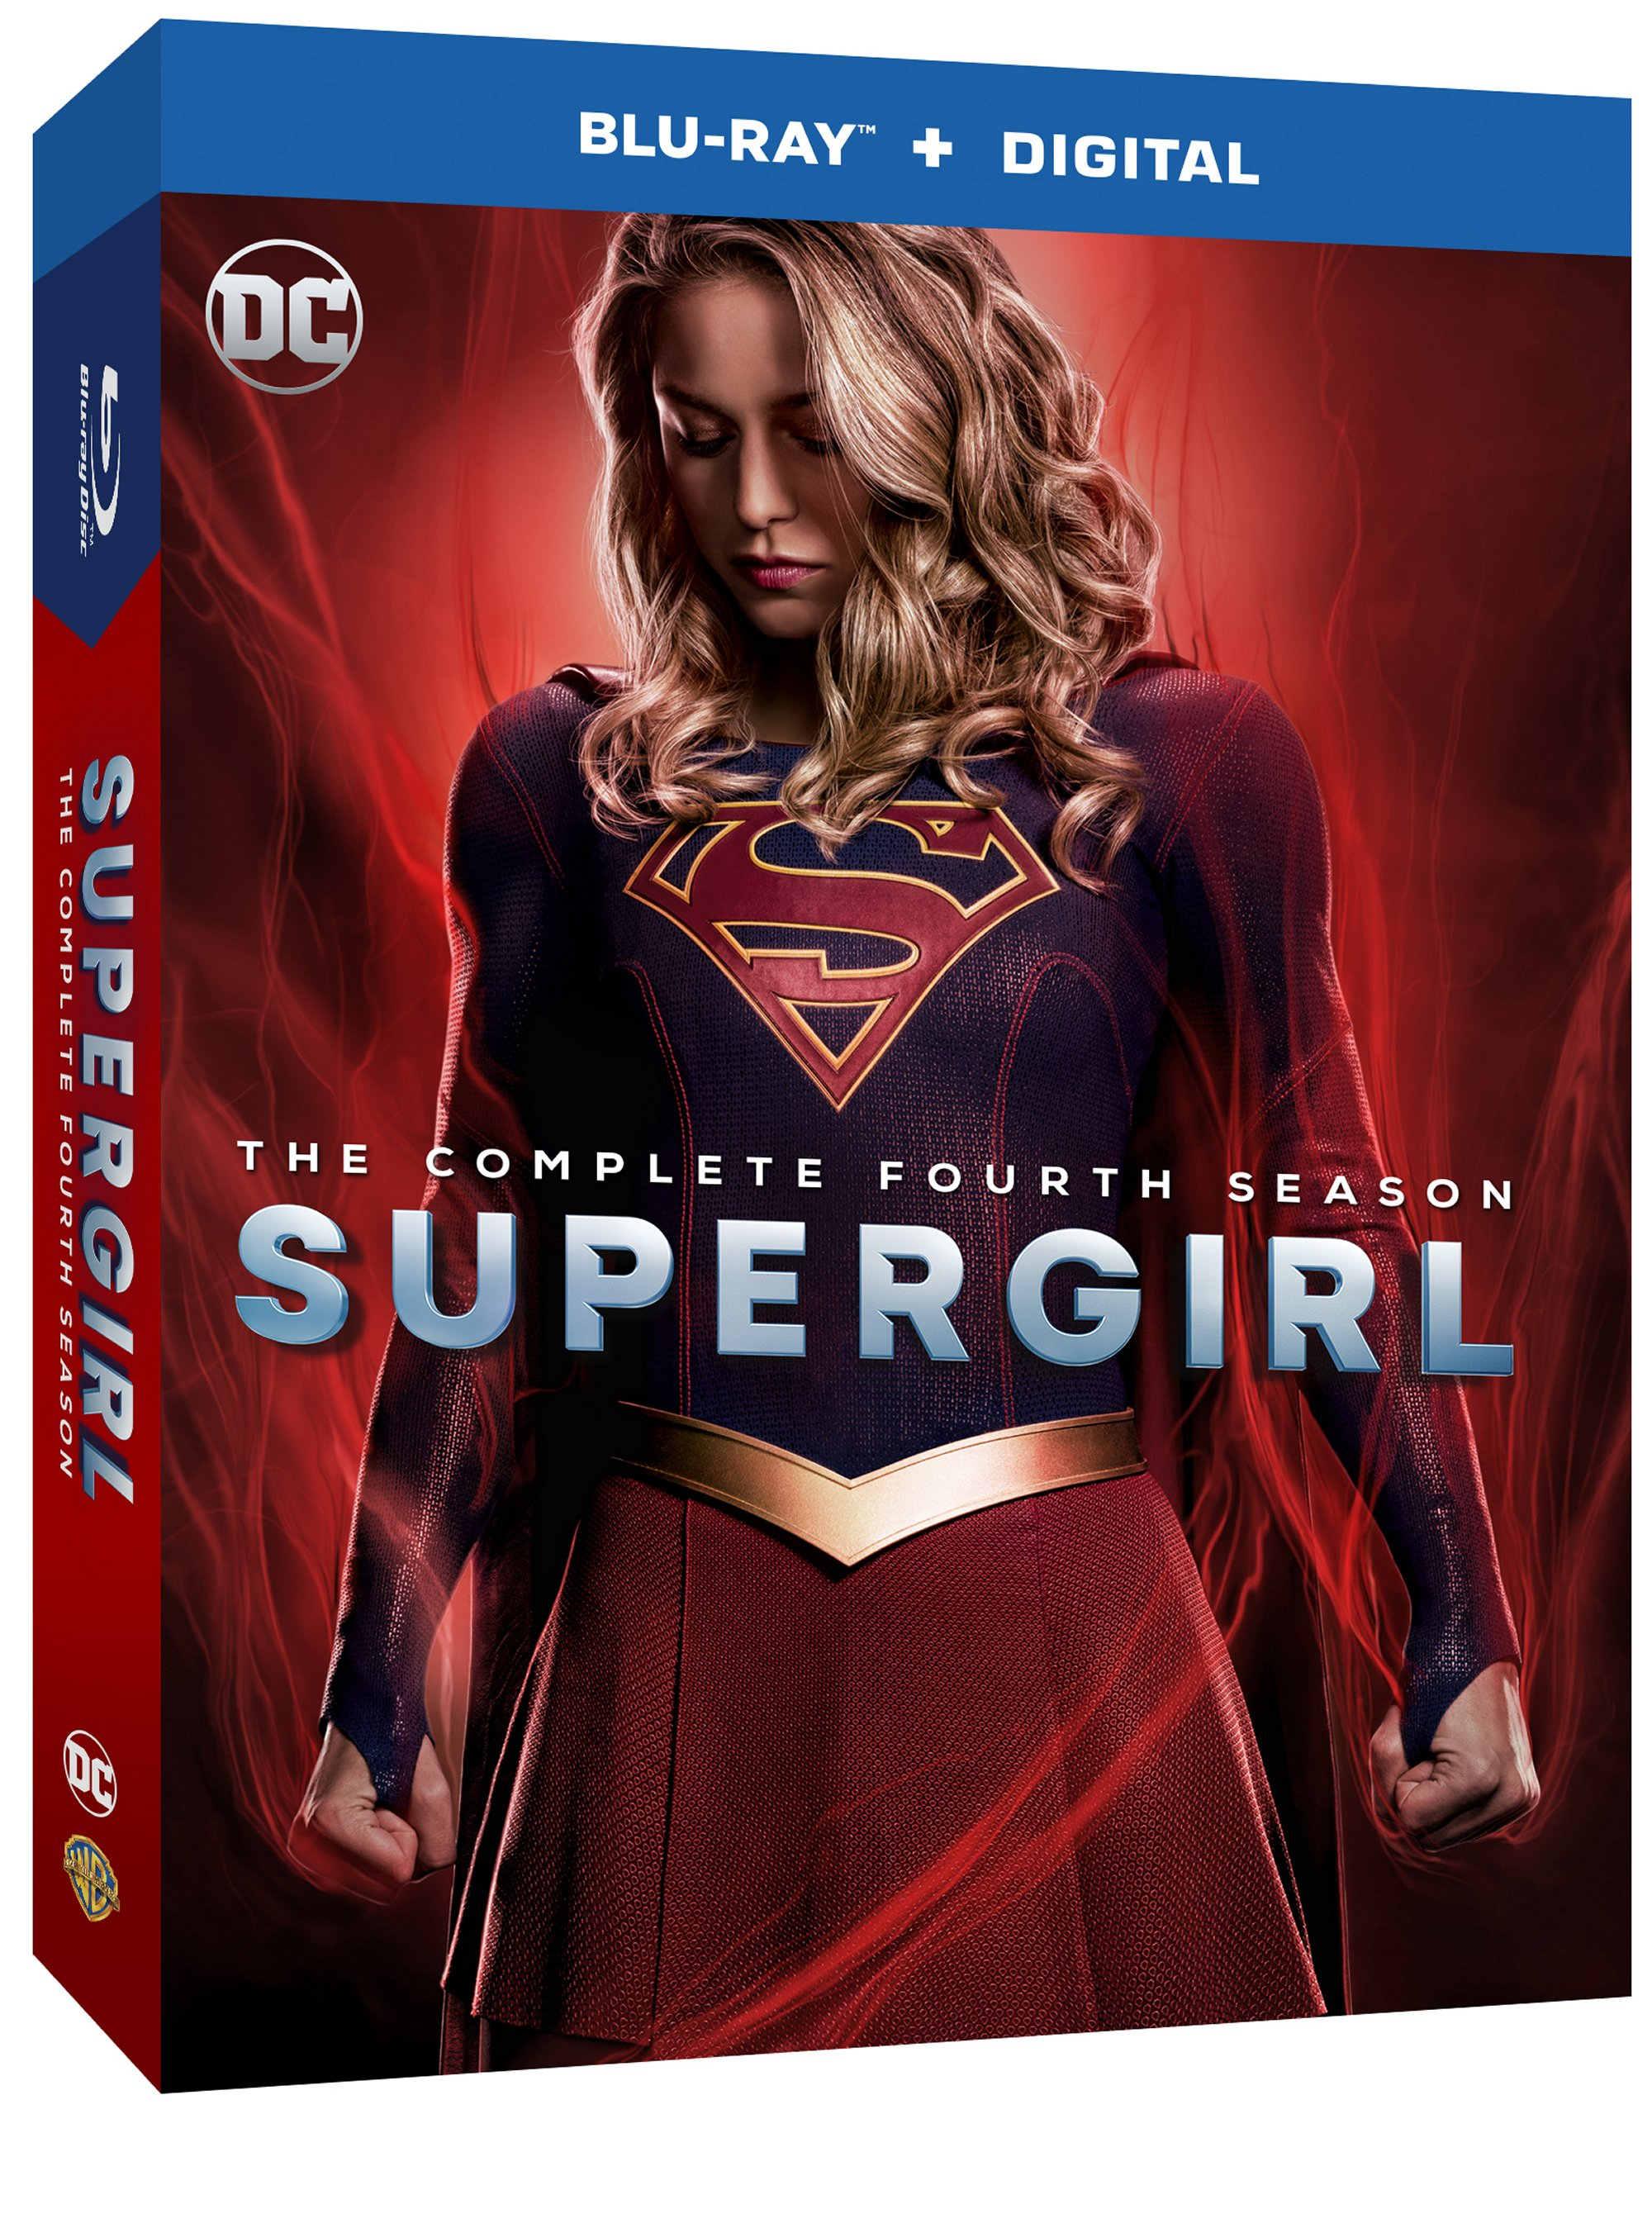 Supergirl S4 BD Box Art1.JPEG